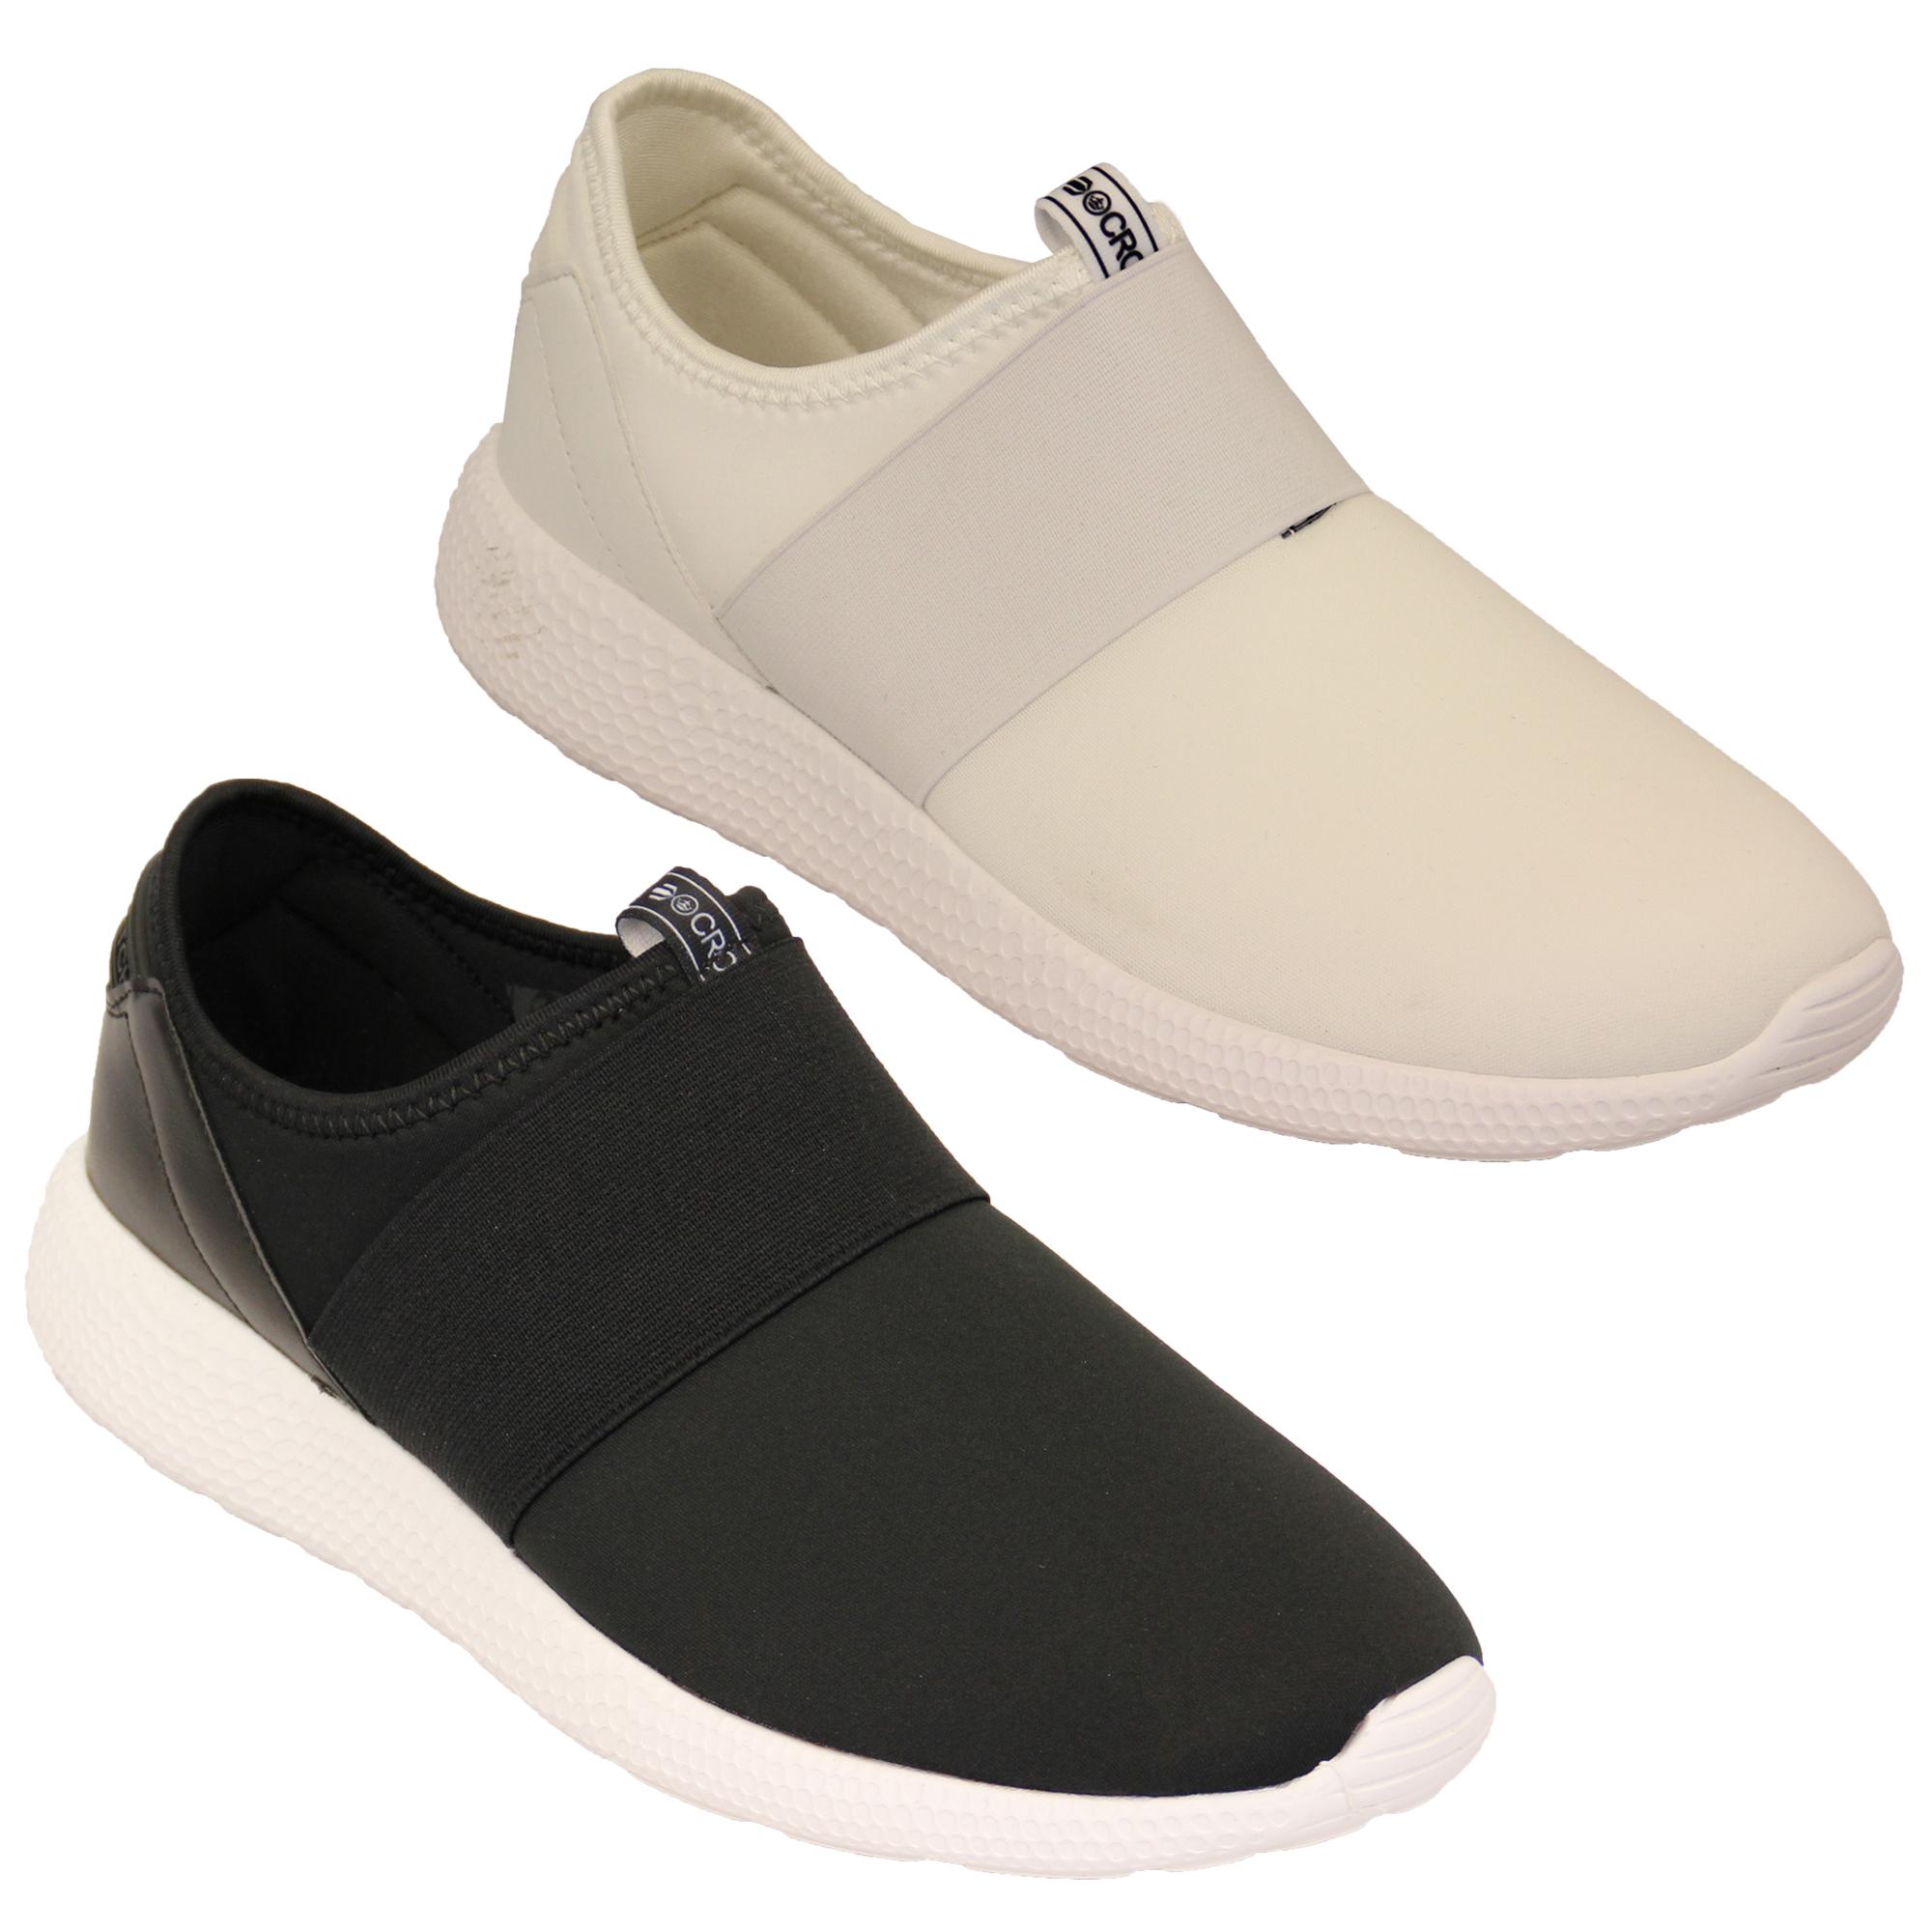 mens trainers crosshatch slip on running sneakers pumps